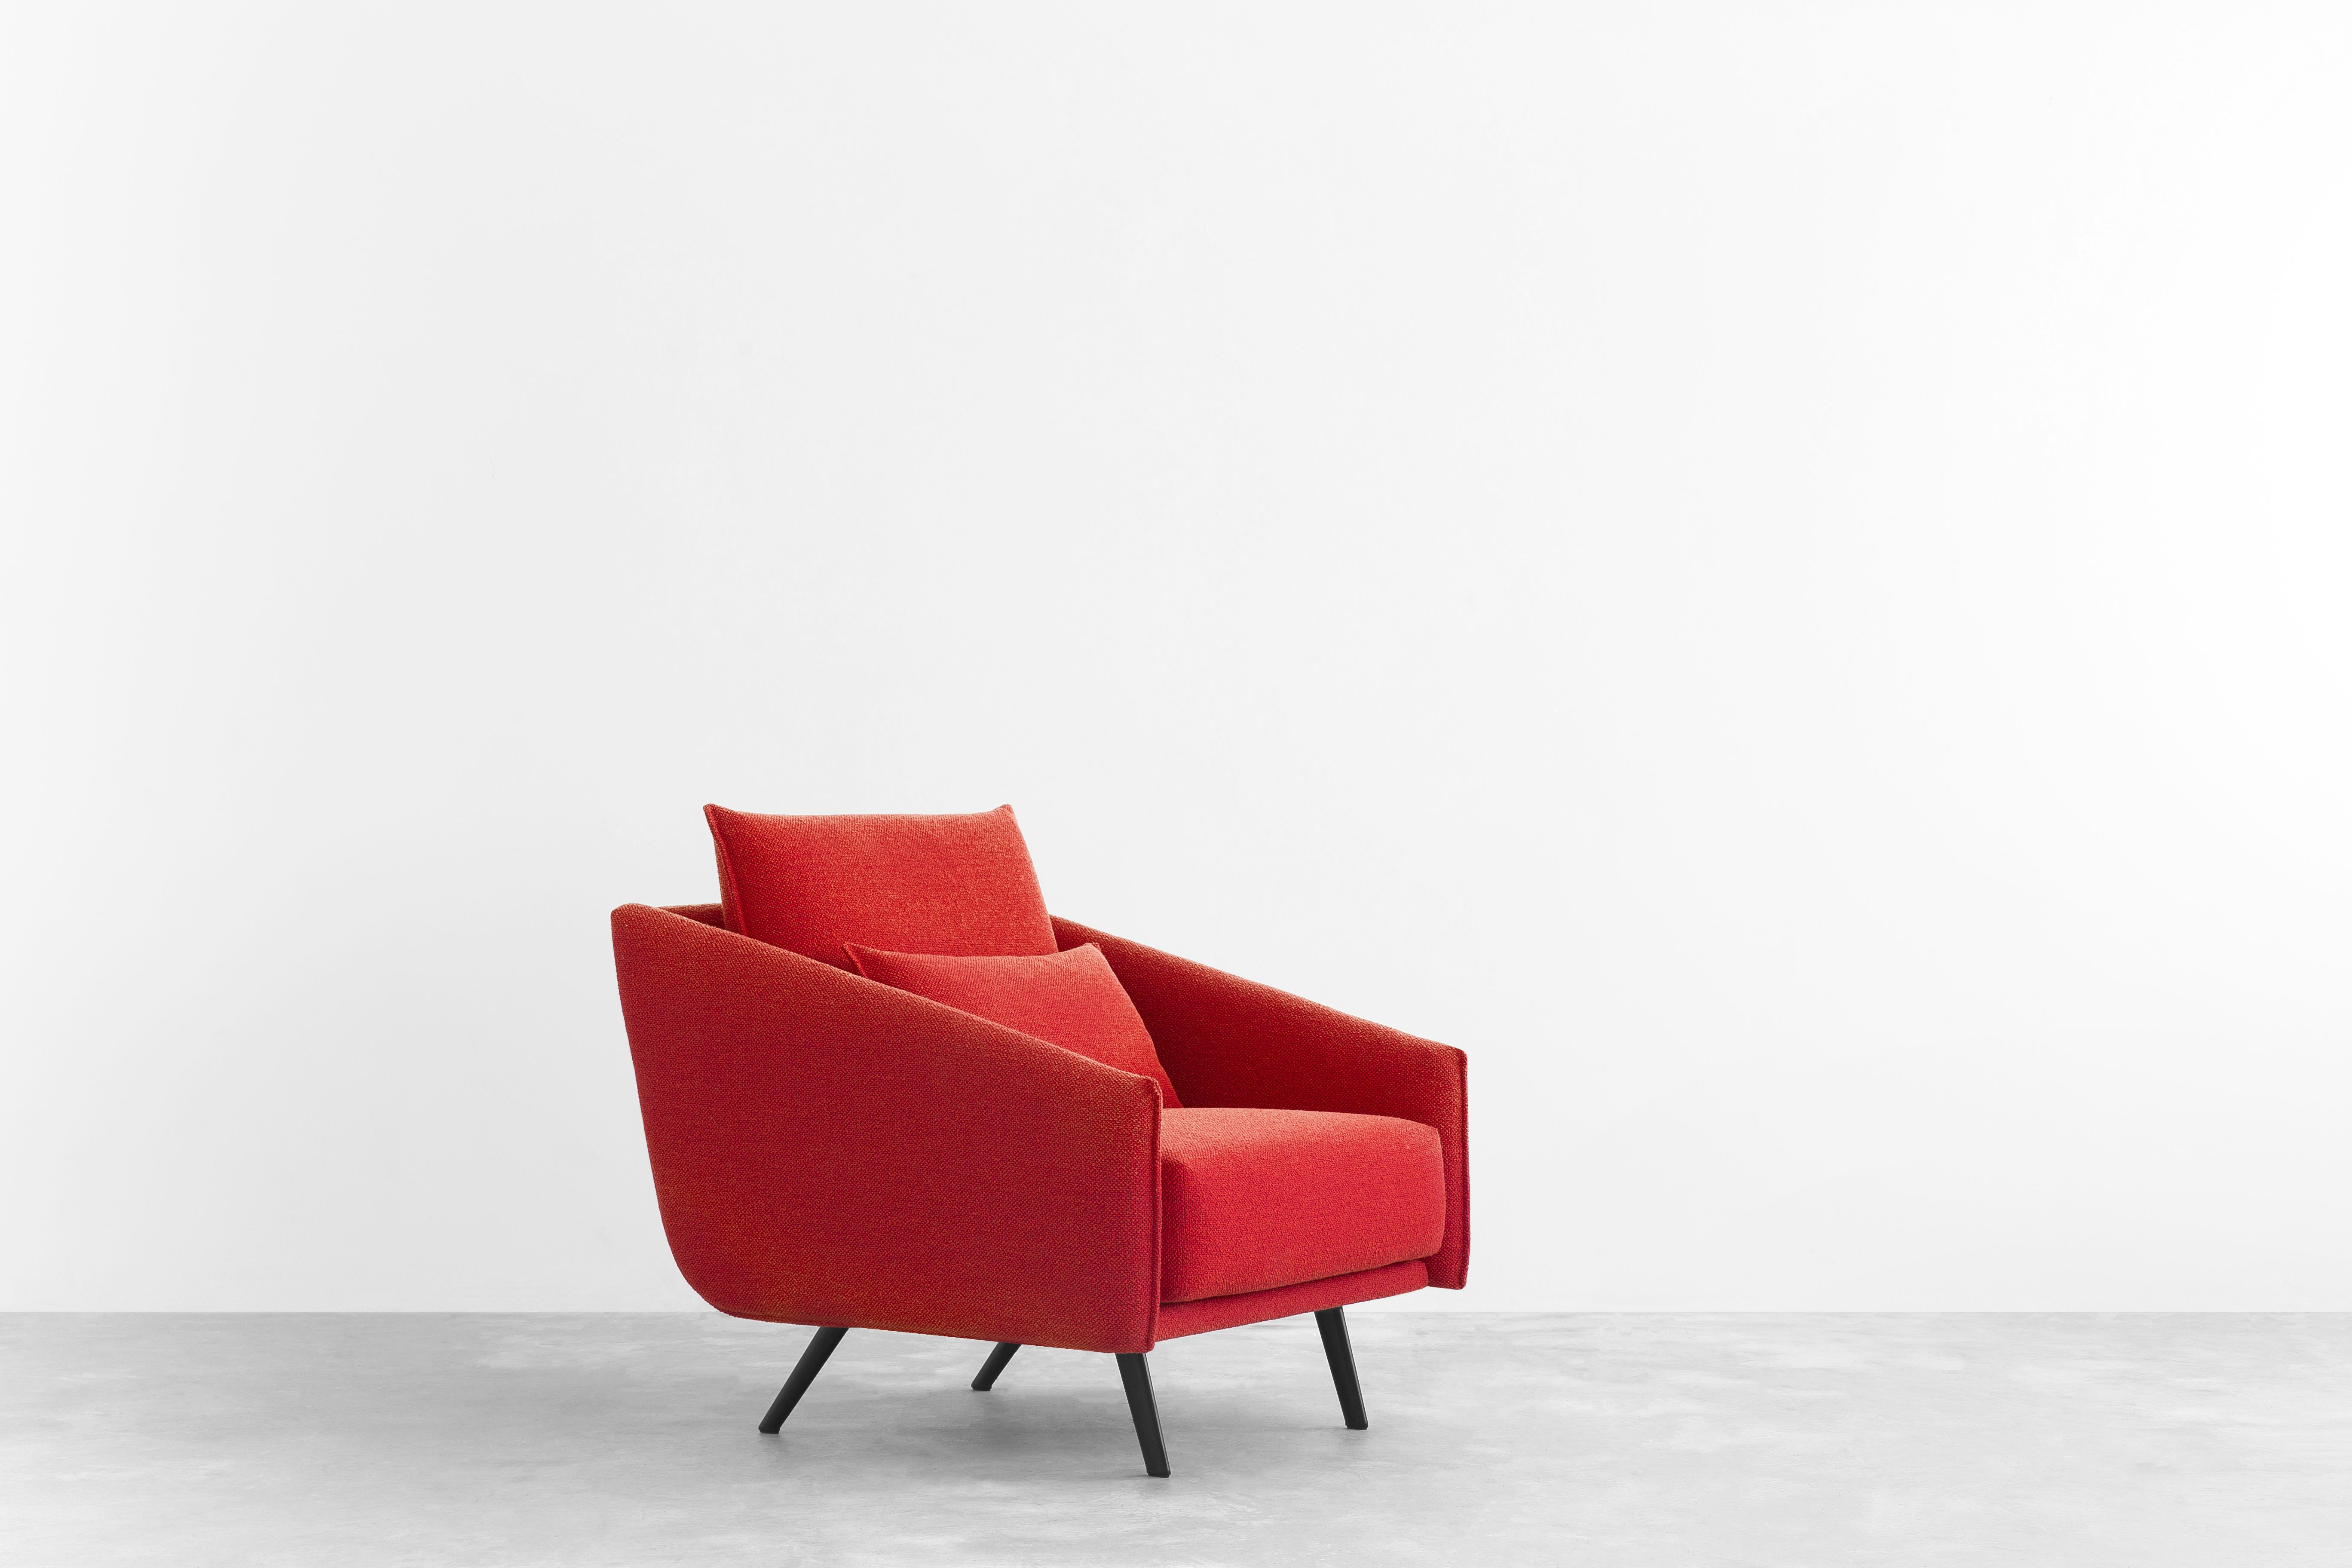 STUA Costura armchair, comfort with style. A Jon Gasca design. COSTURA: www.stua.com/design/costura